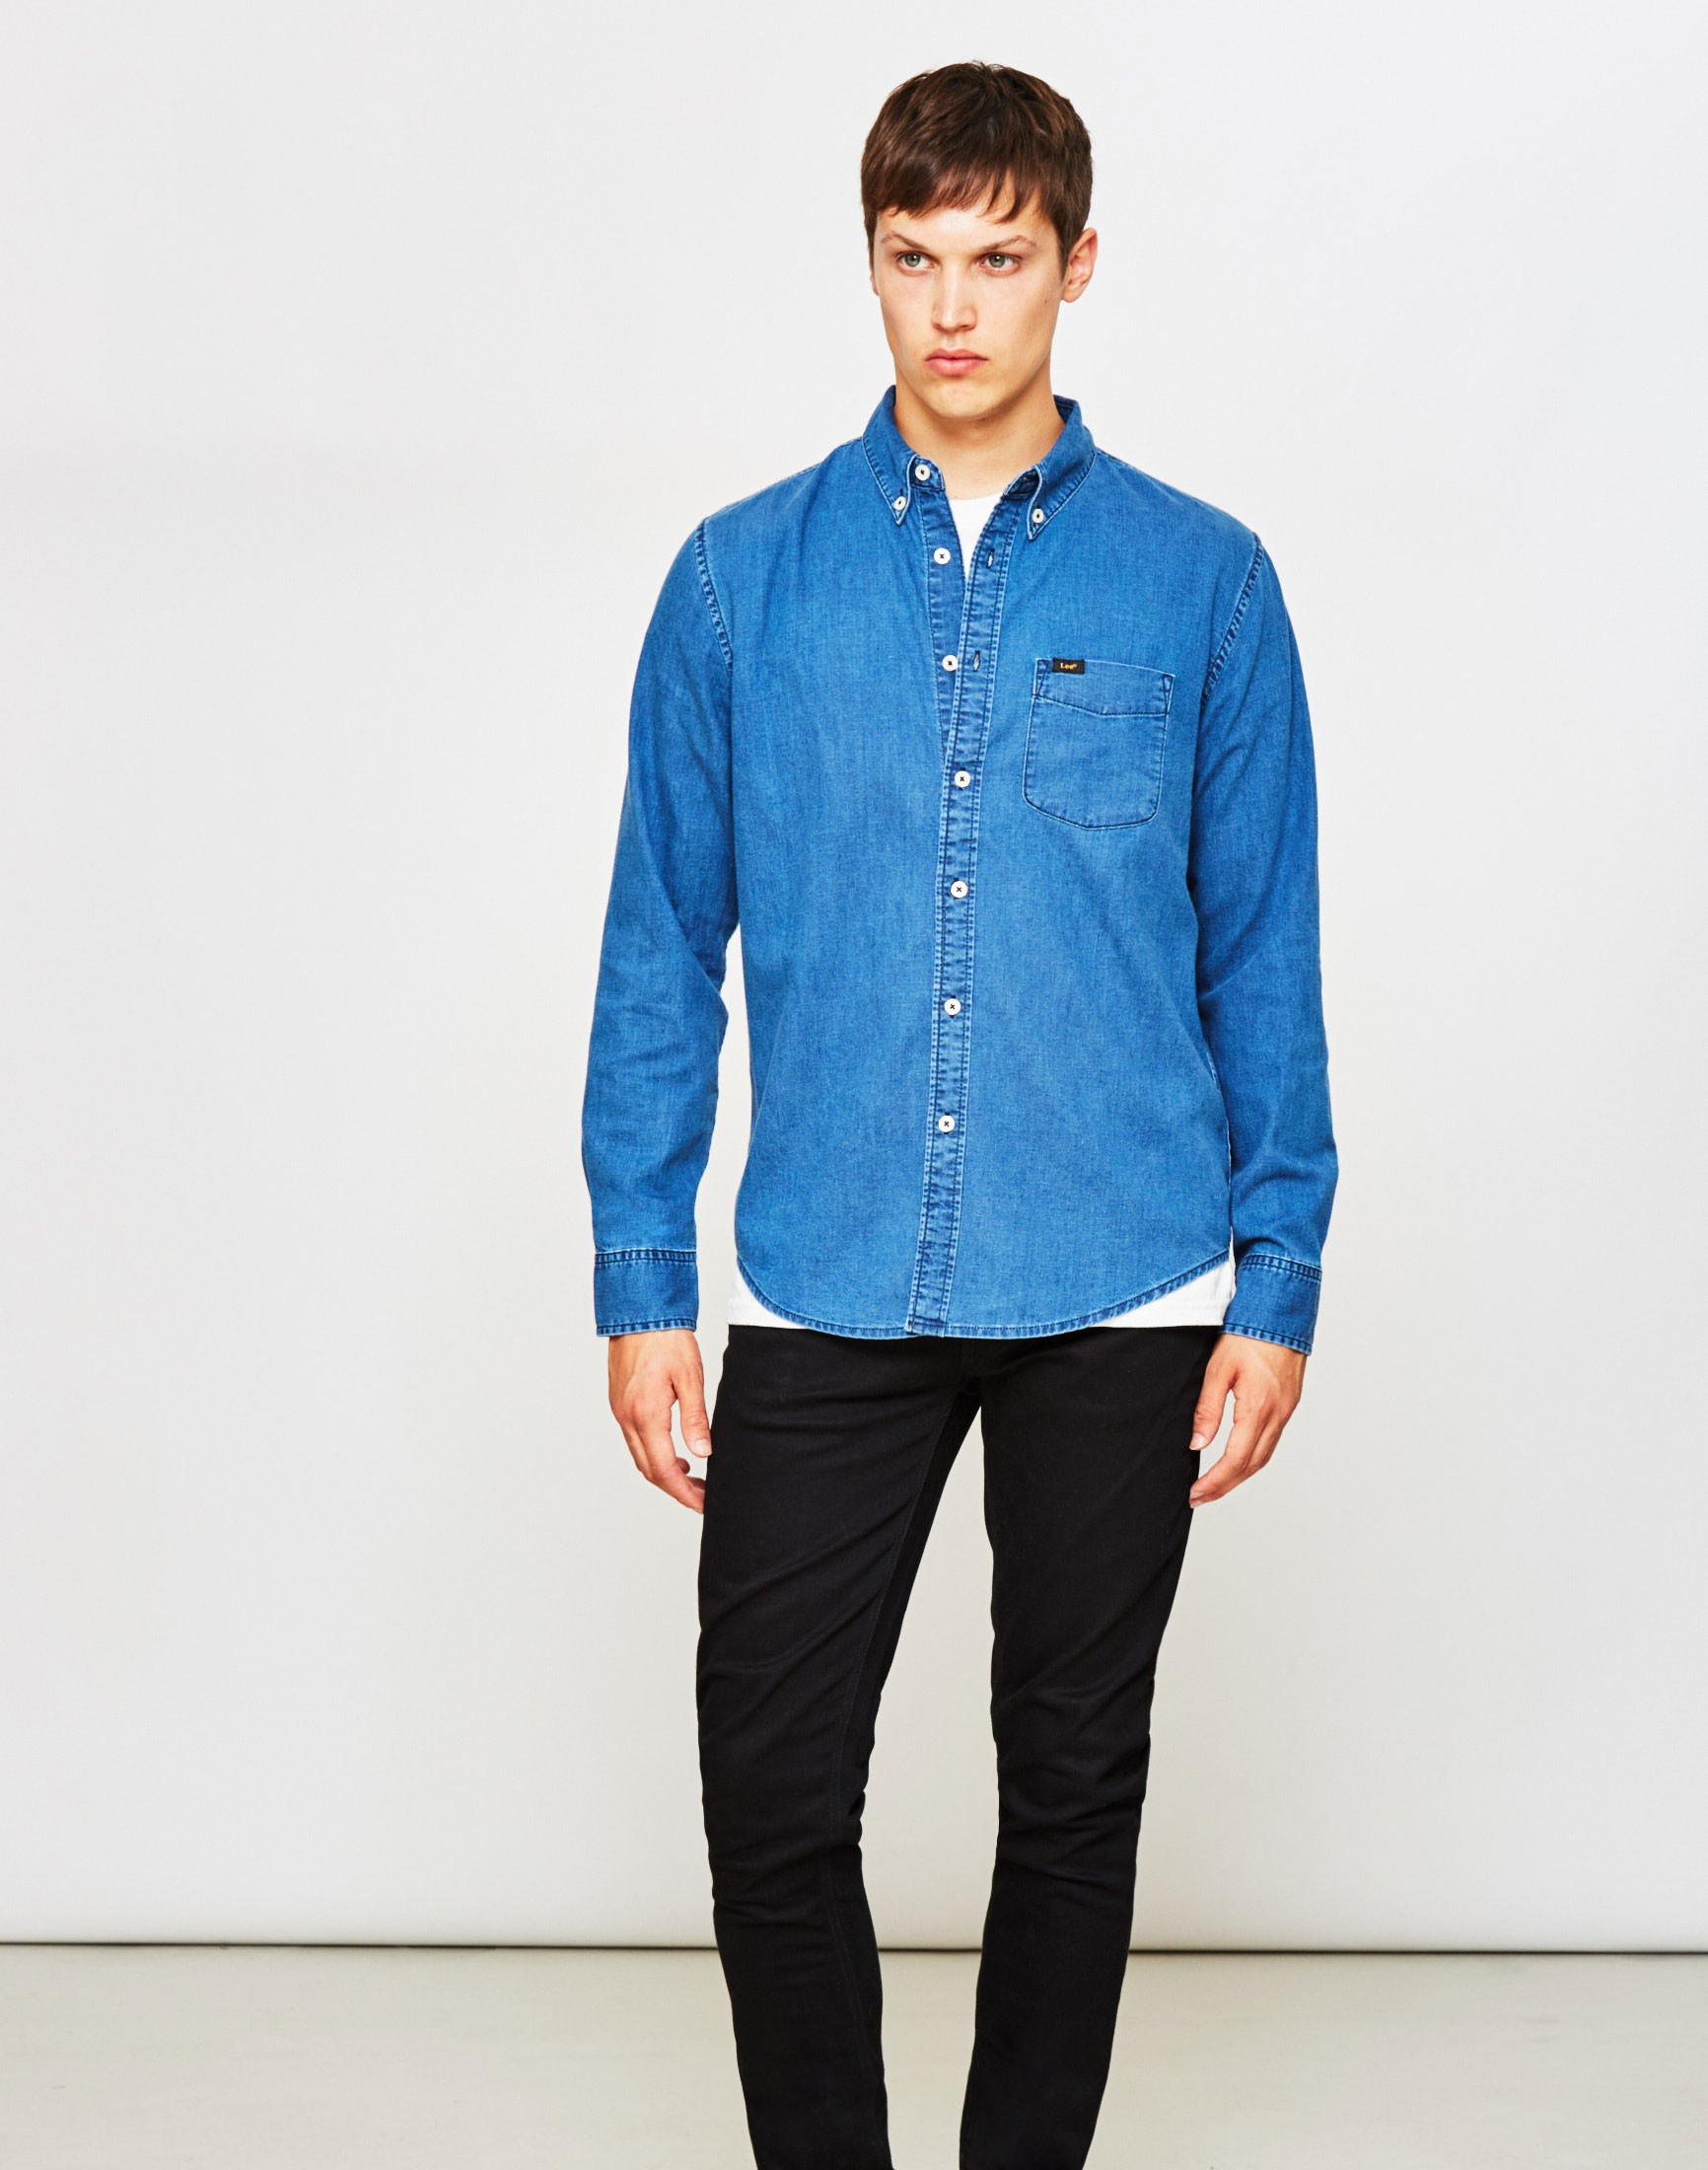 Lyst lee jeans lee button down denim shirt blue in blue for Denim button down shirts